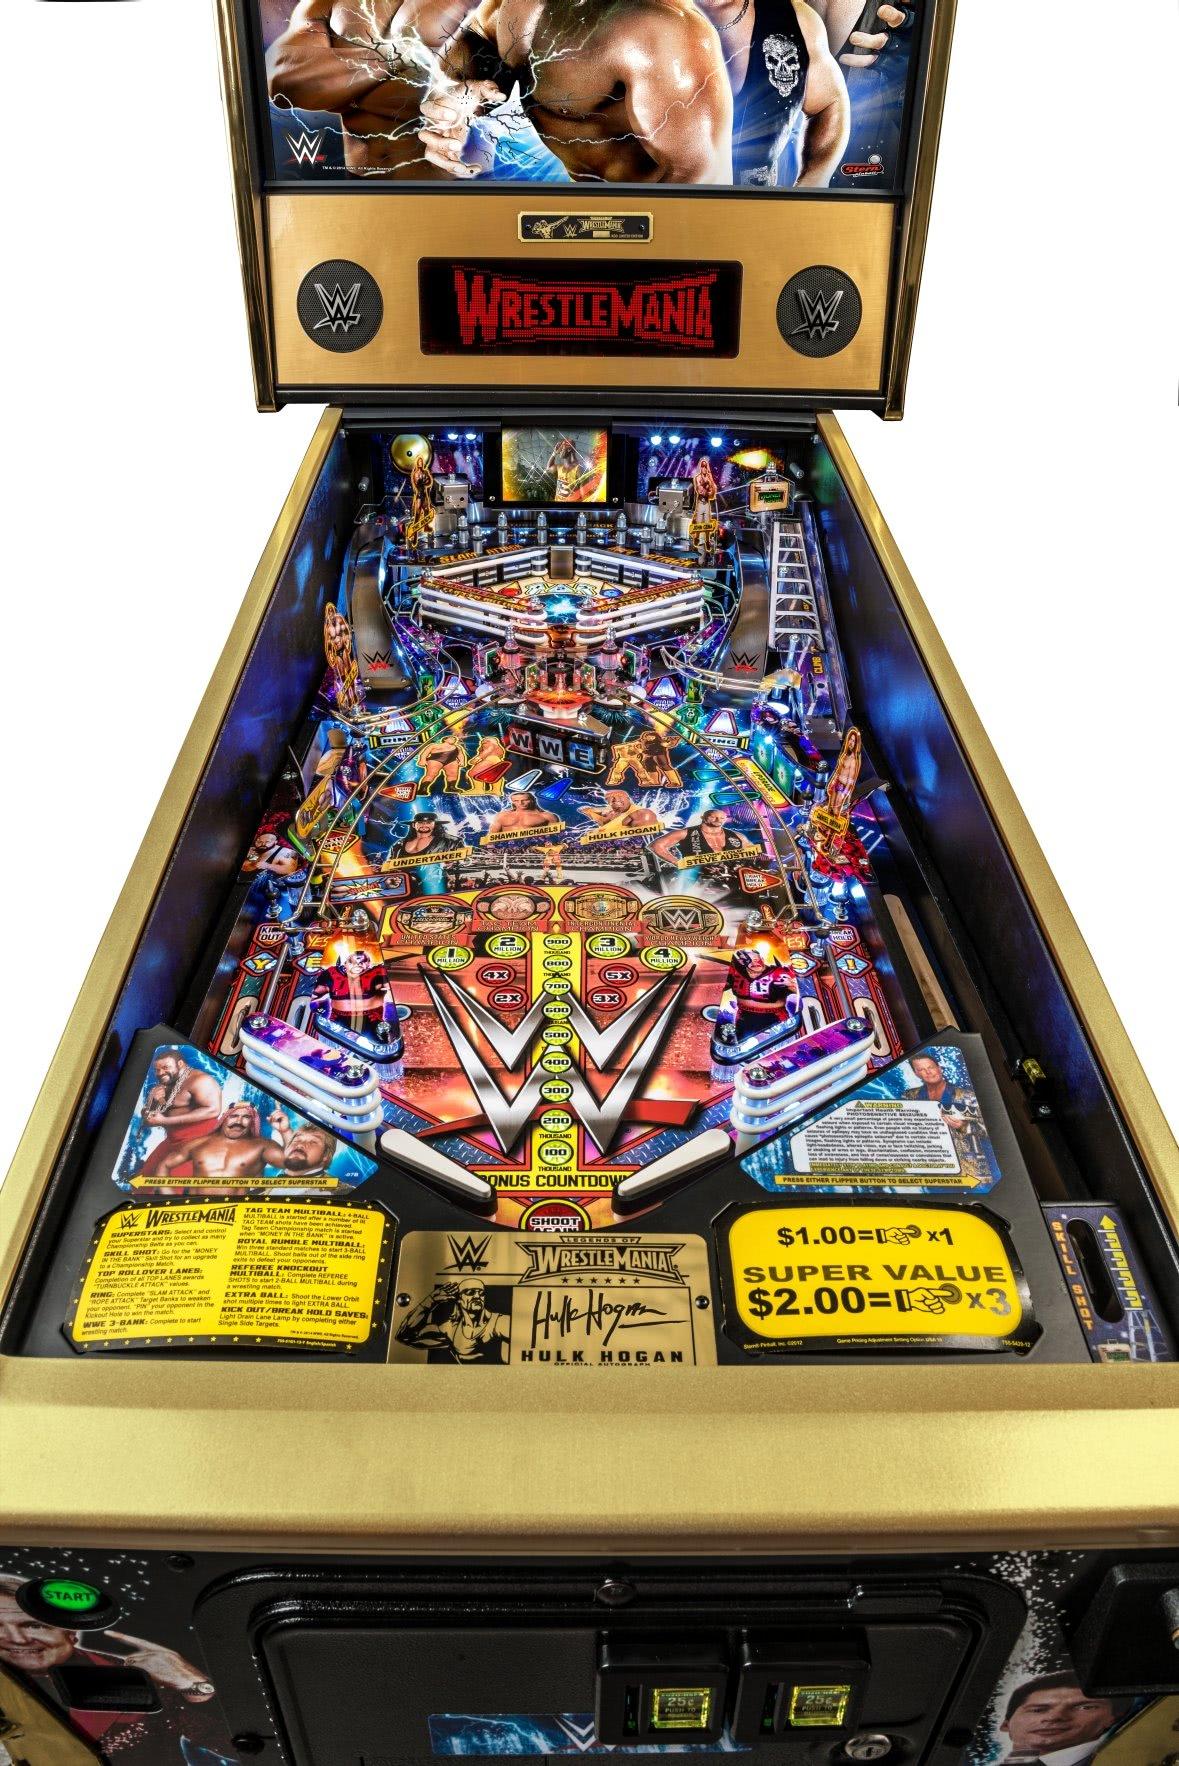 Stern Wwe Wrestlemania Le Pinball Machine Liberty Games